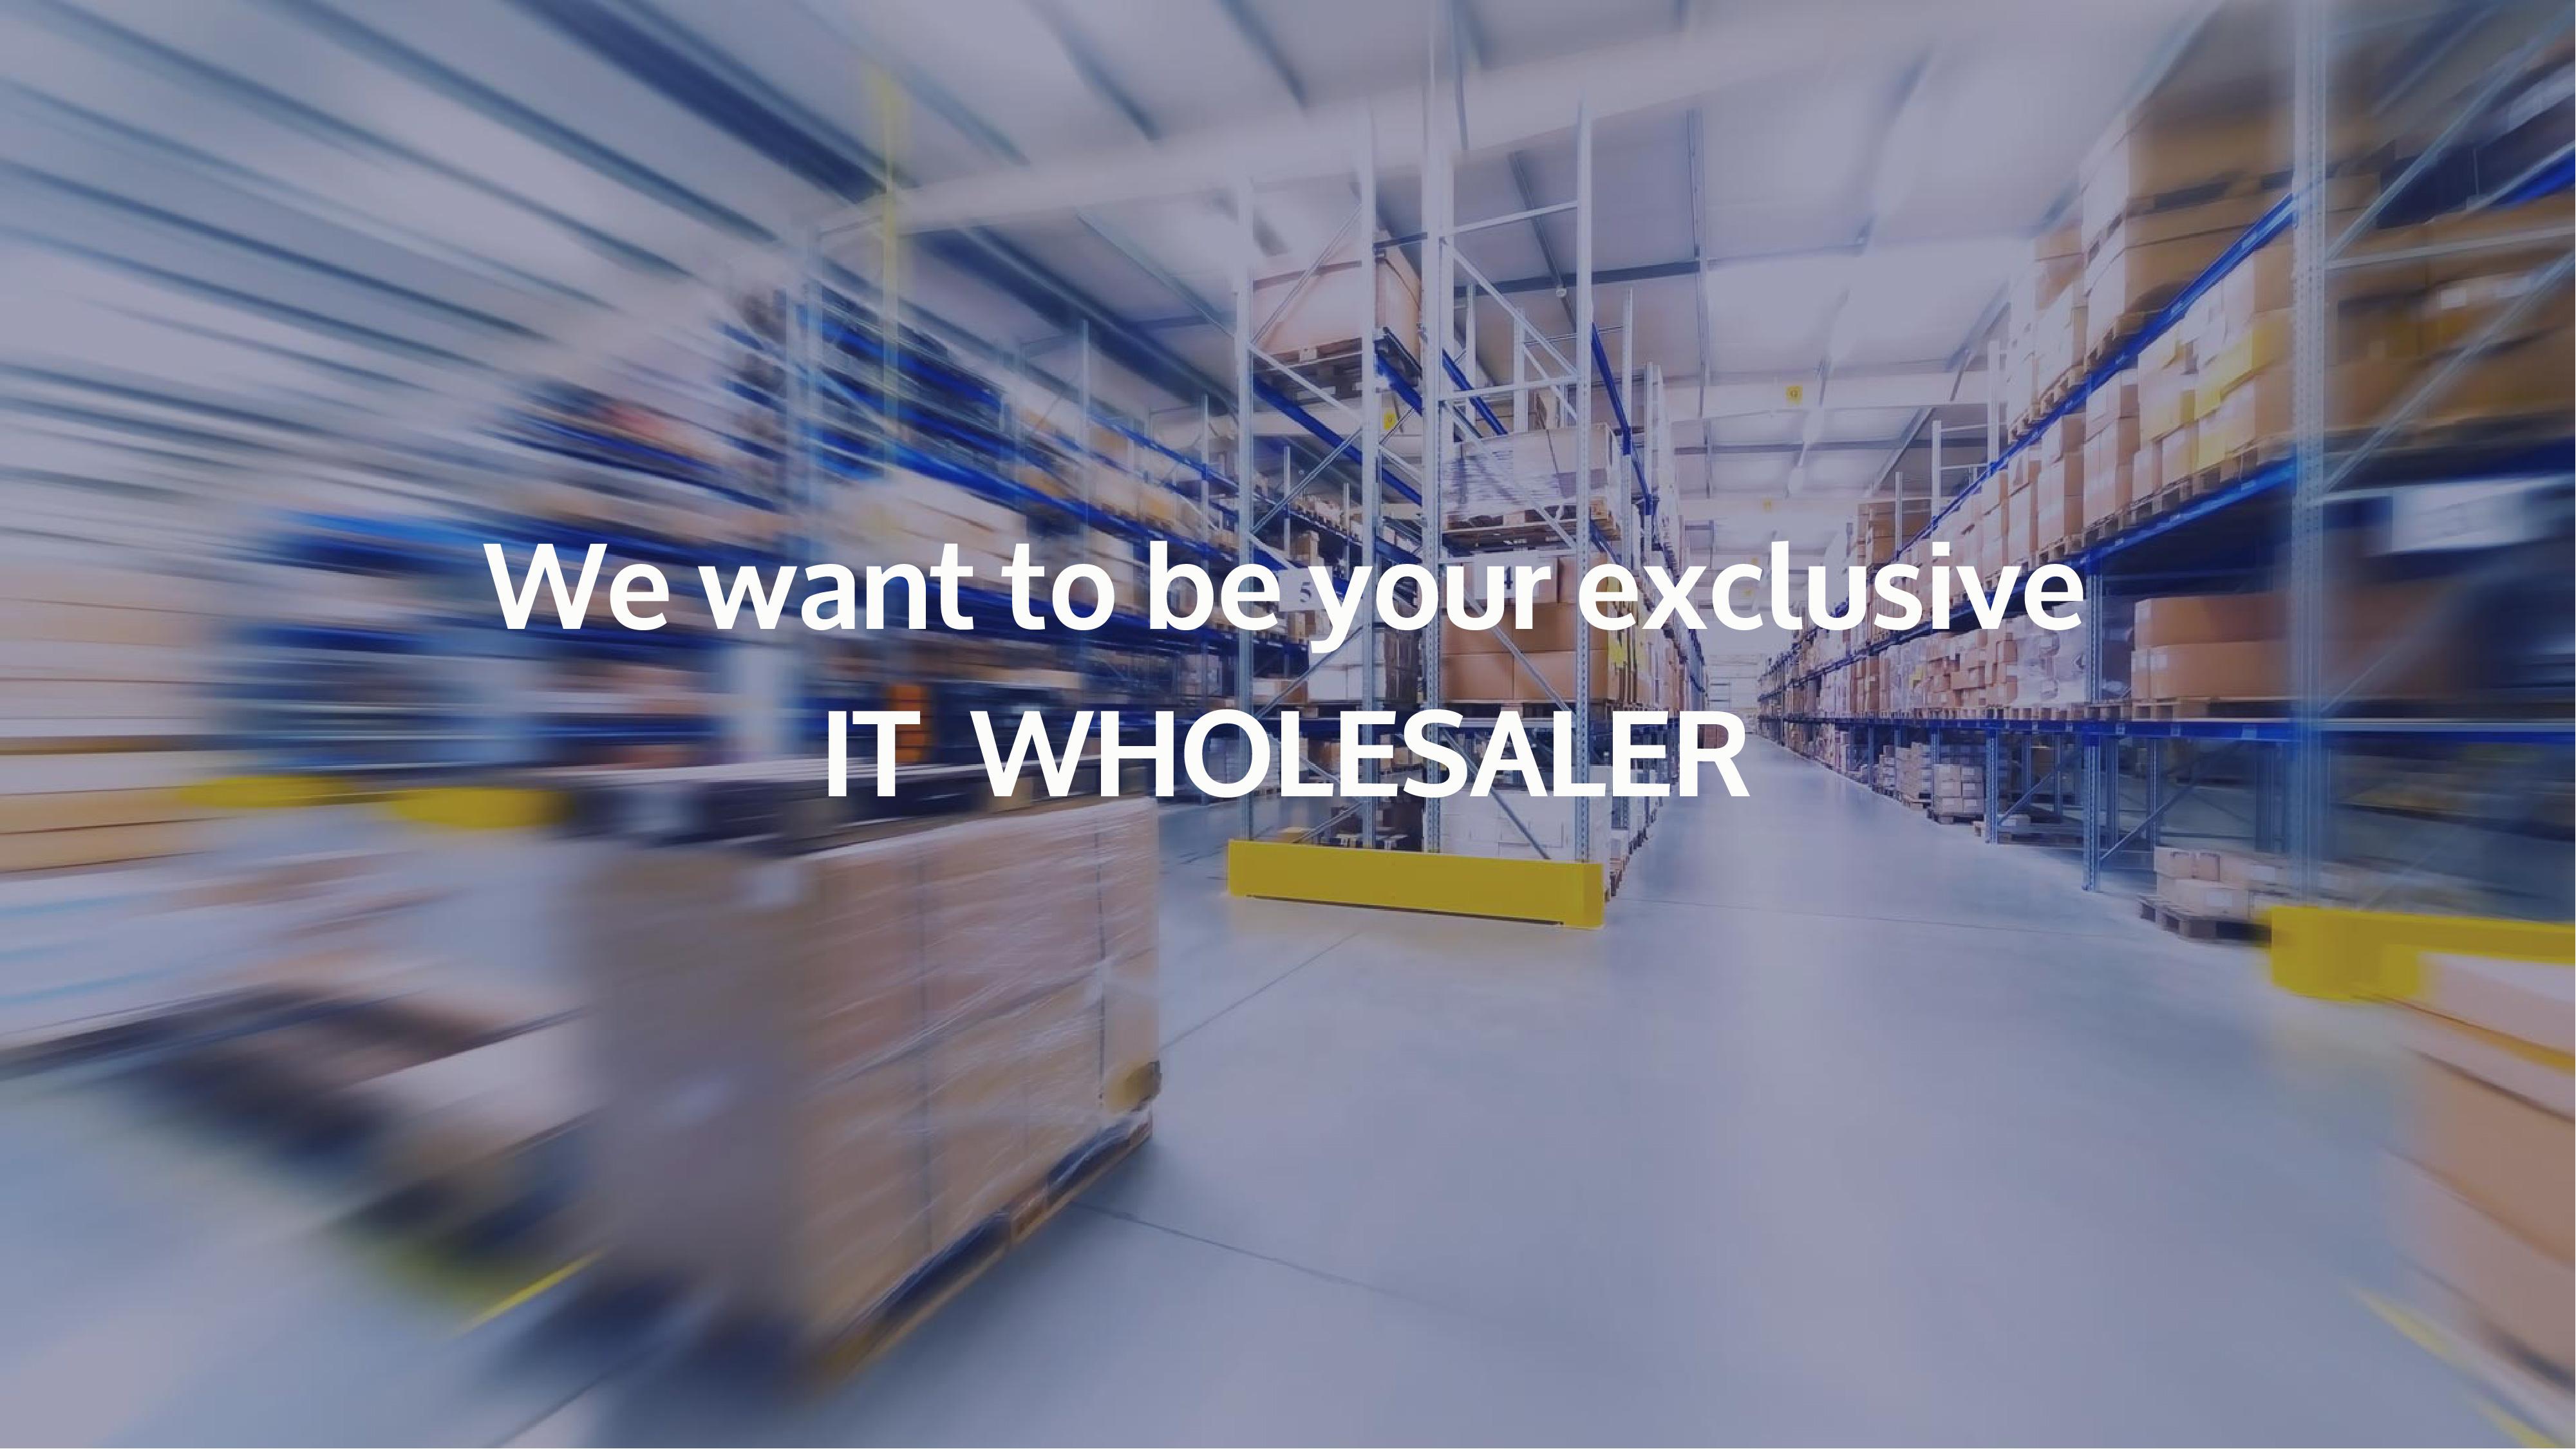 IT Wholesaler Spain, buy refurbished mobile phones, laptops, tablets and surface